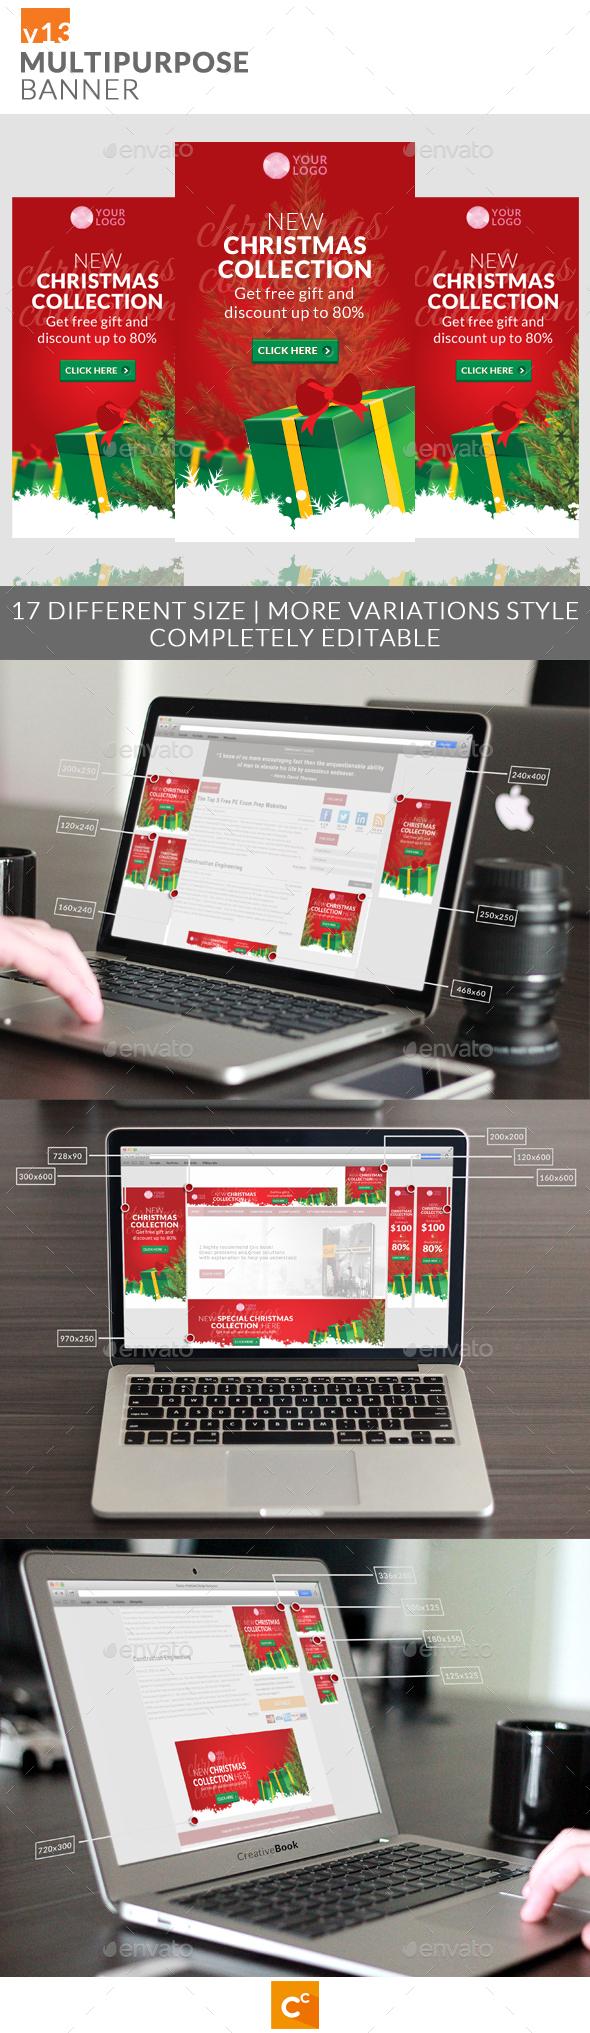 Multipurpose Banner Ads v13 - Banners & Ads Web Elements